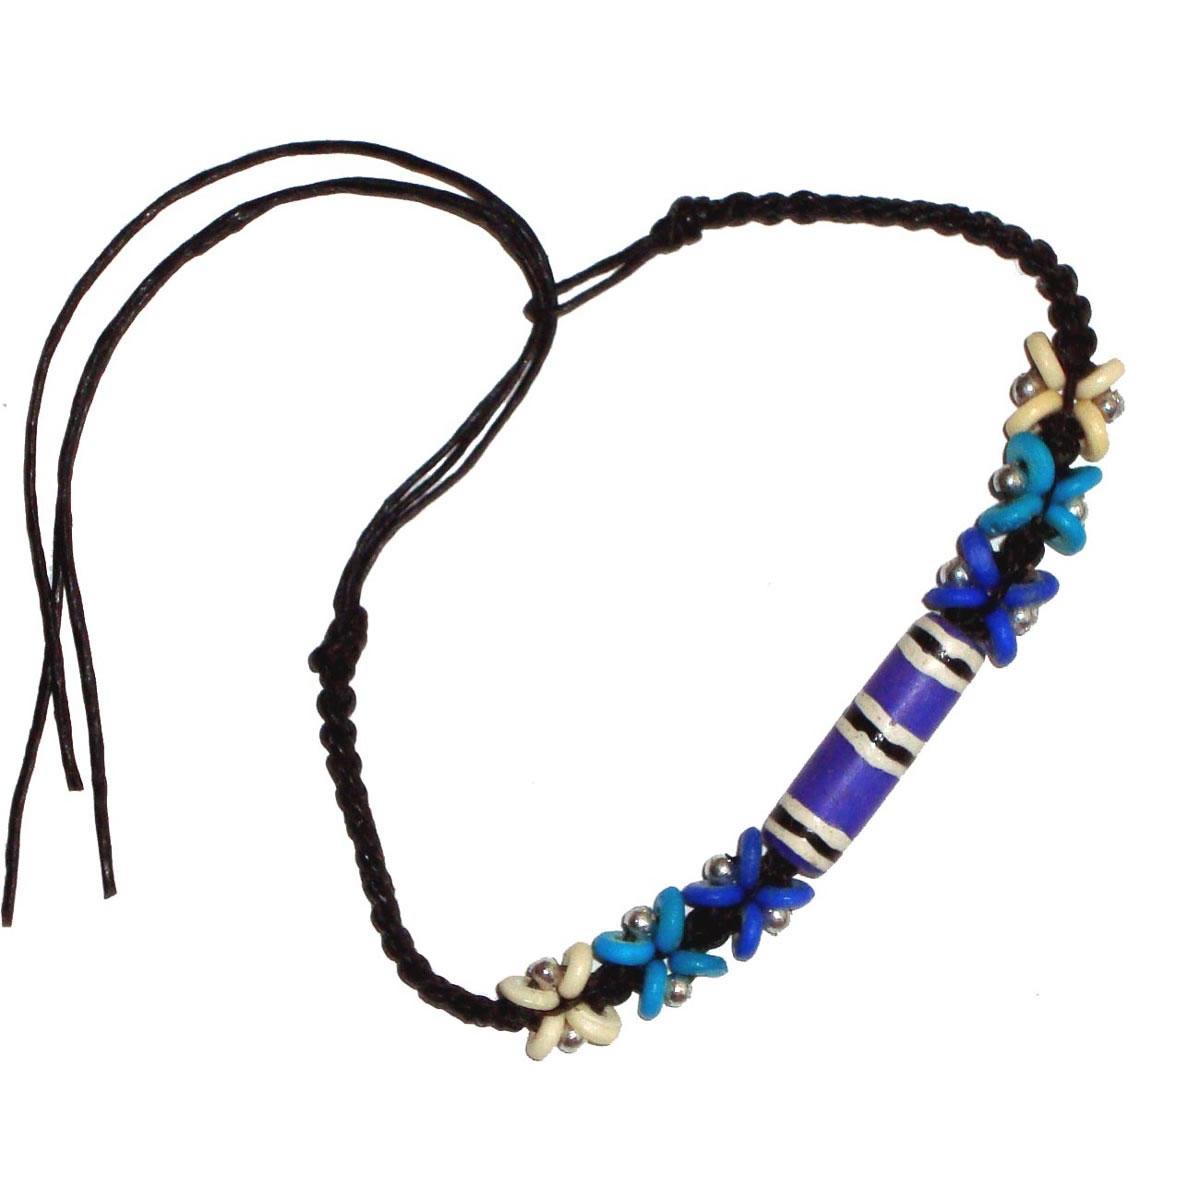 Colourful Beads Wristband [A]